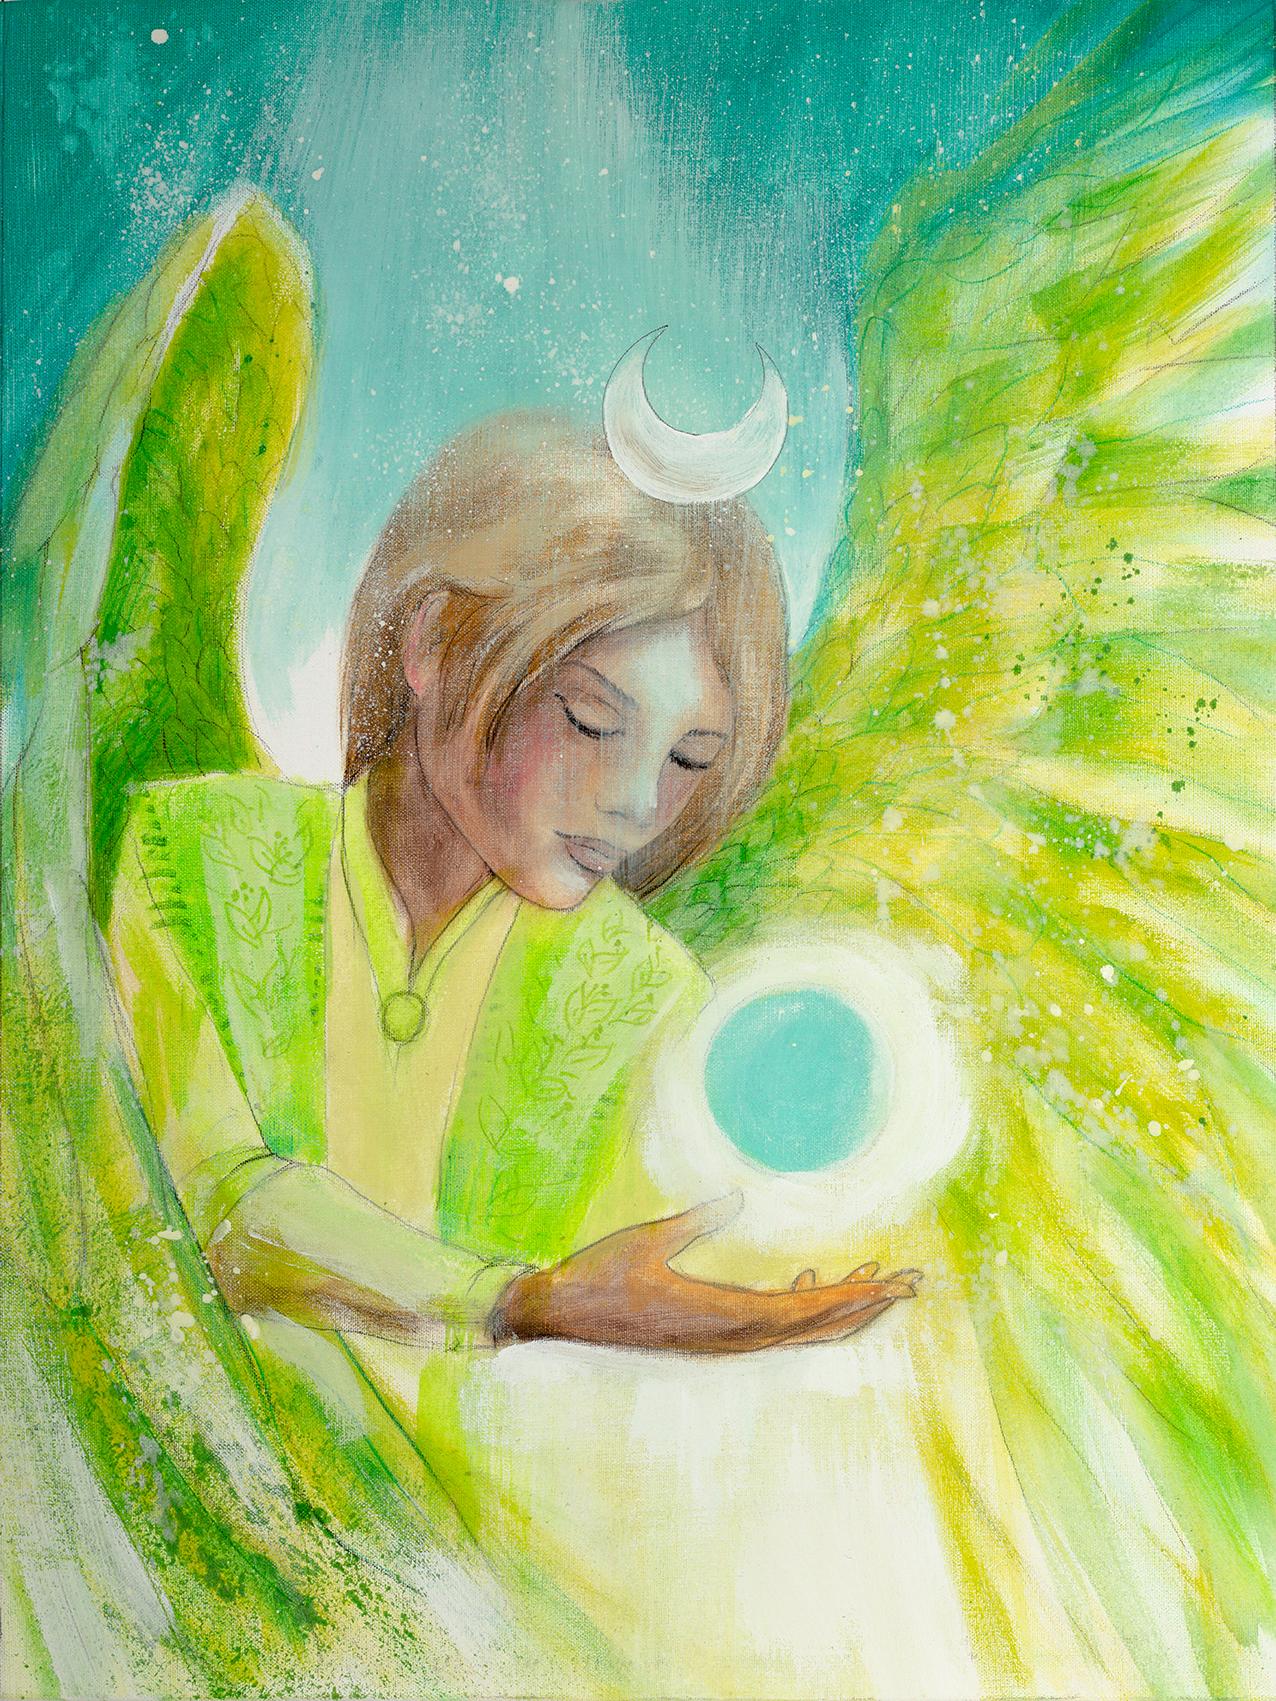 Engel der Heilung / Einklang aller Wesen